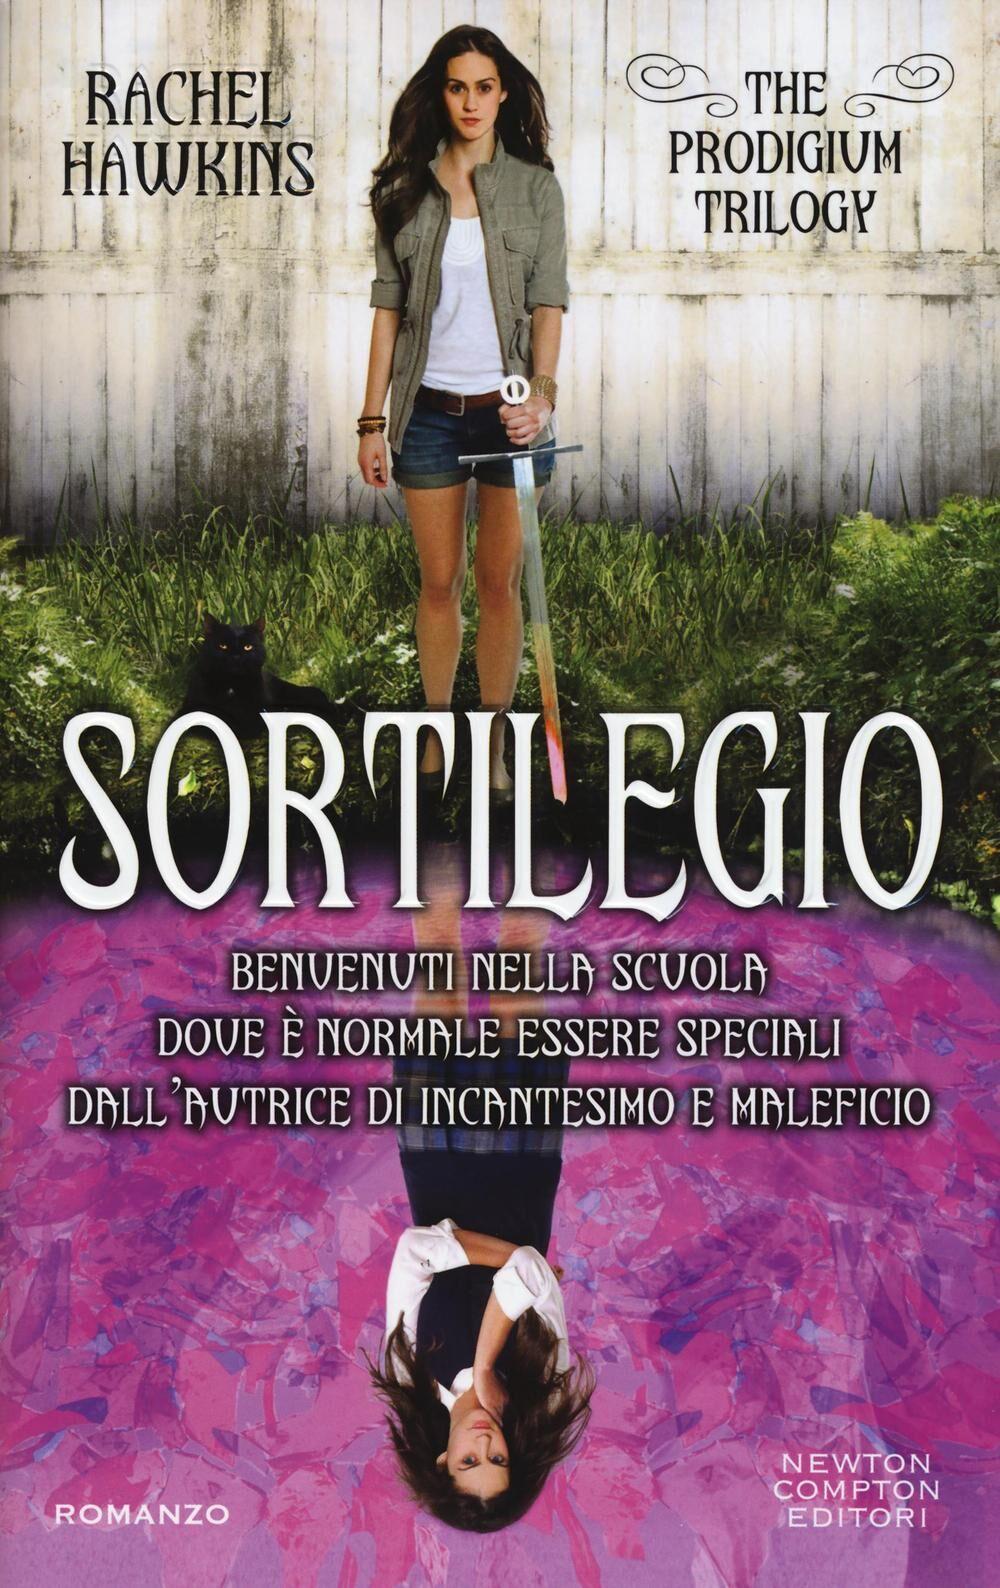 Sortilegio. The Prodigium trilogy